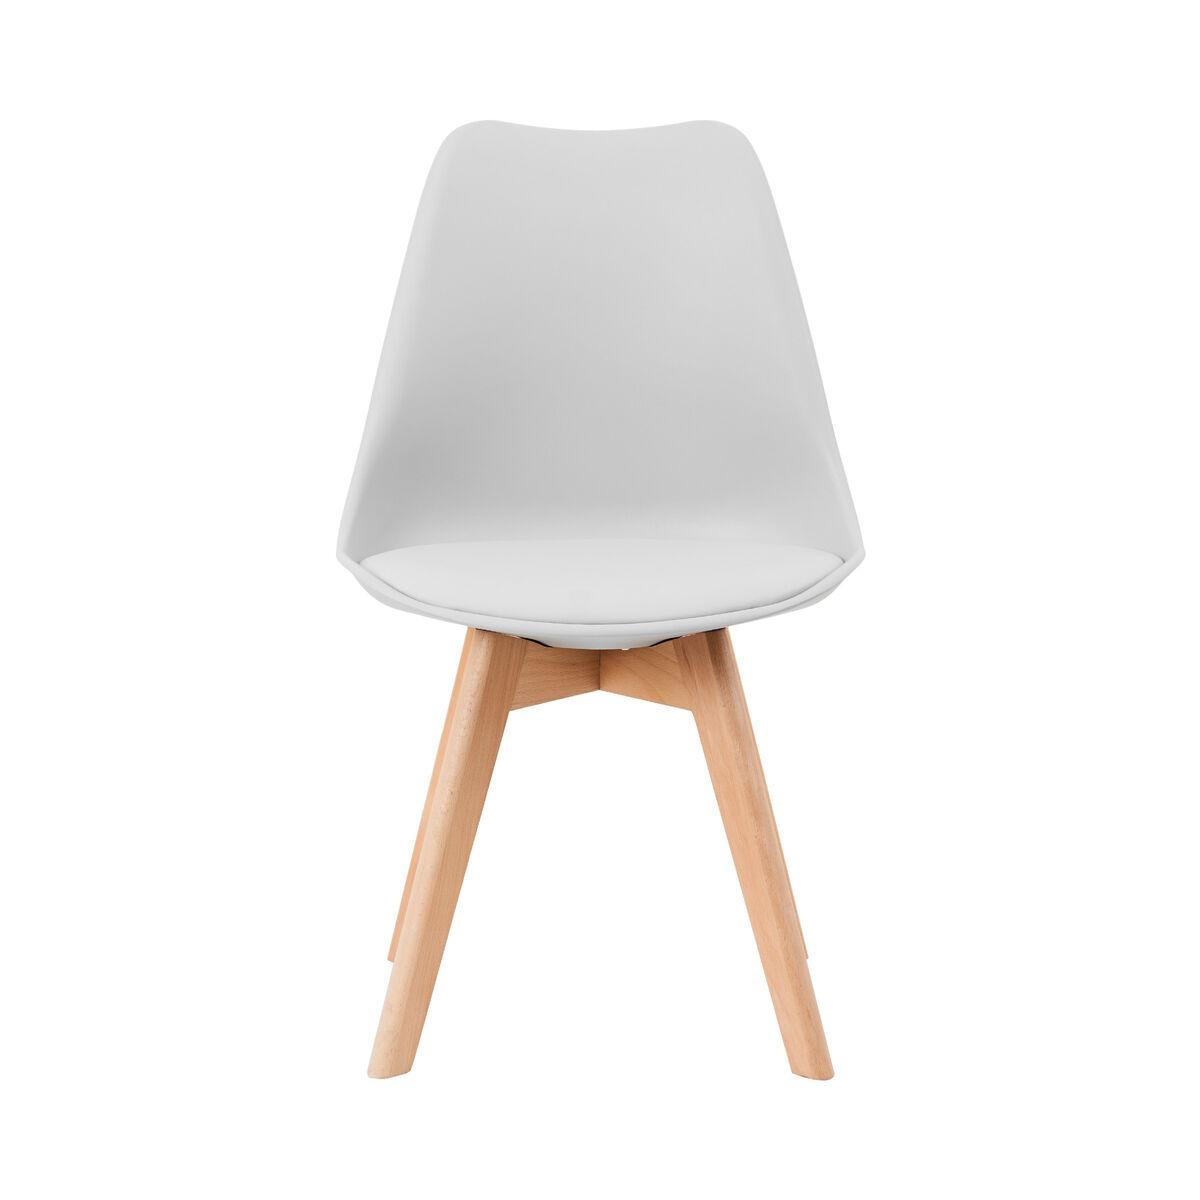 SEAT-OF-THE-ART Stuhl m. Sitzpolster